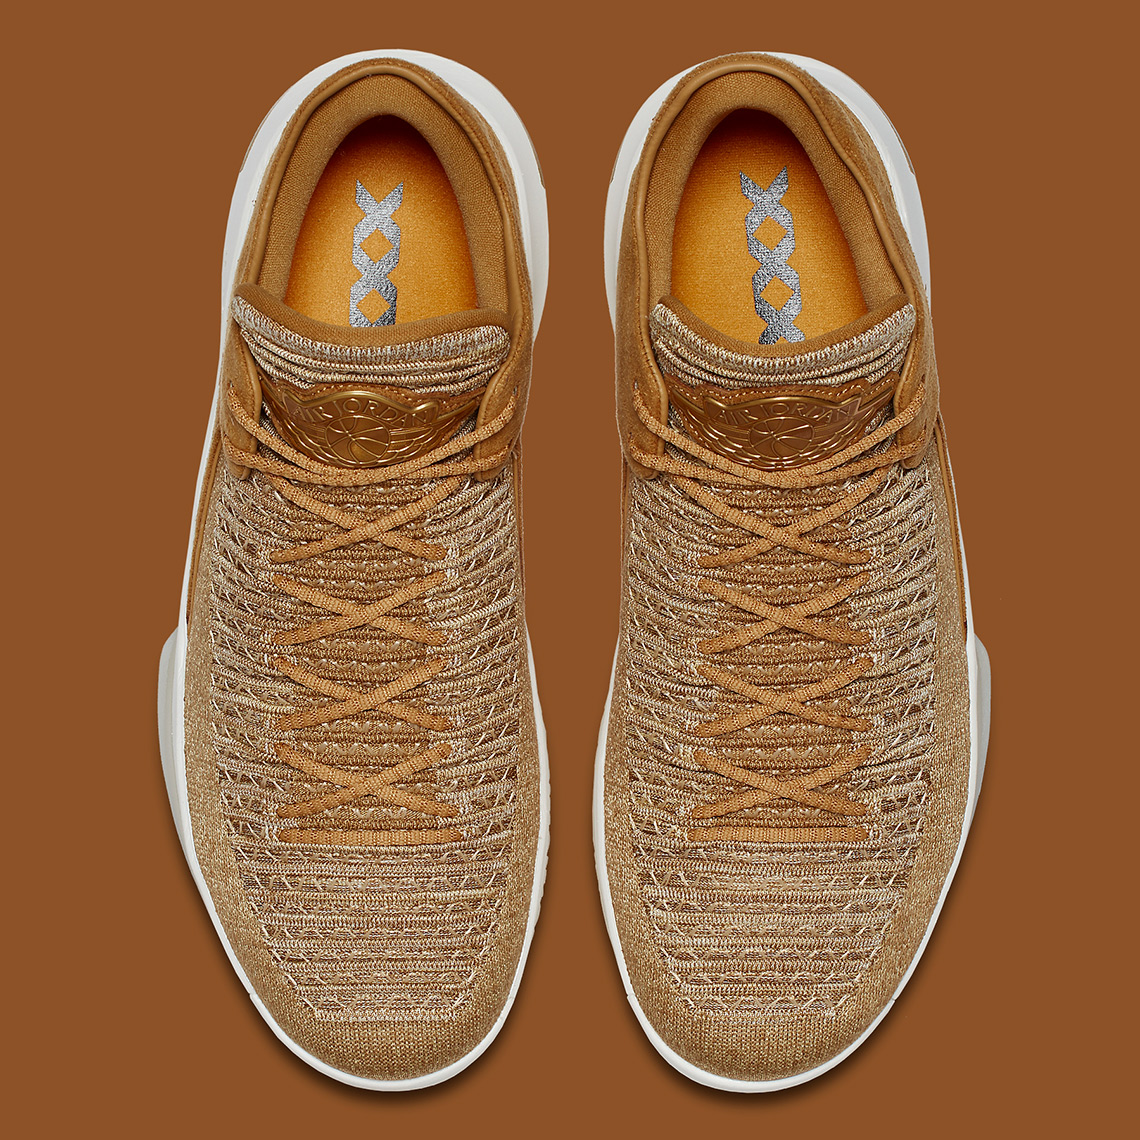 d0f0ef89d107a5 Air Jordan 32 Low Wheat AA1256-700 Release Date